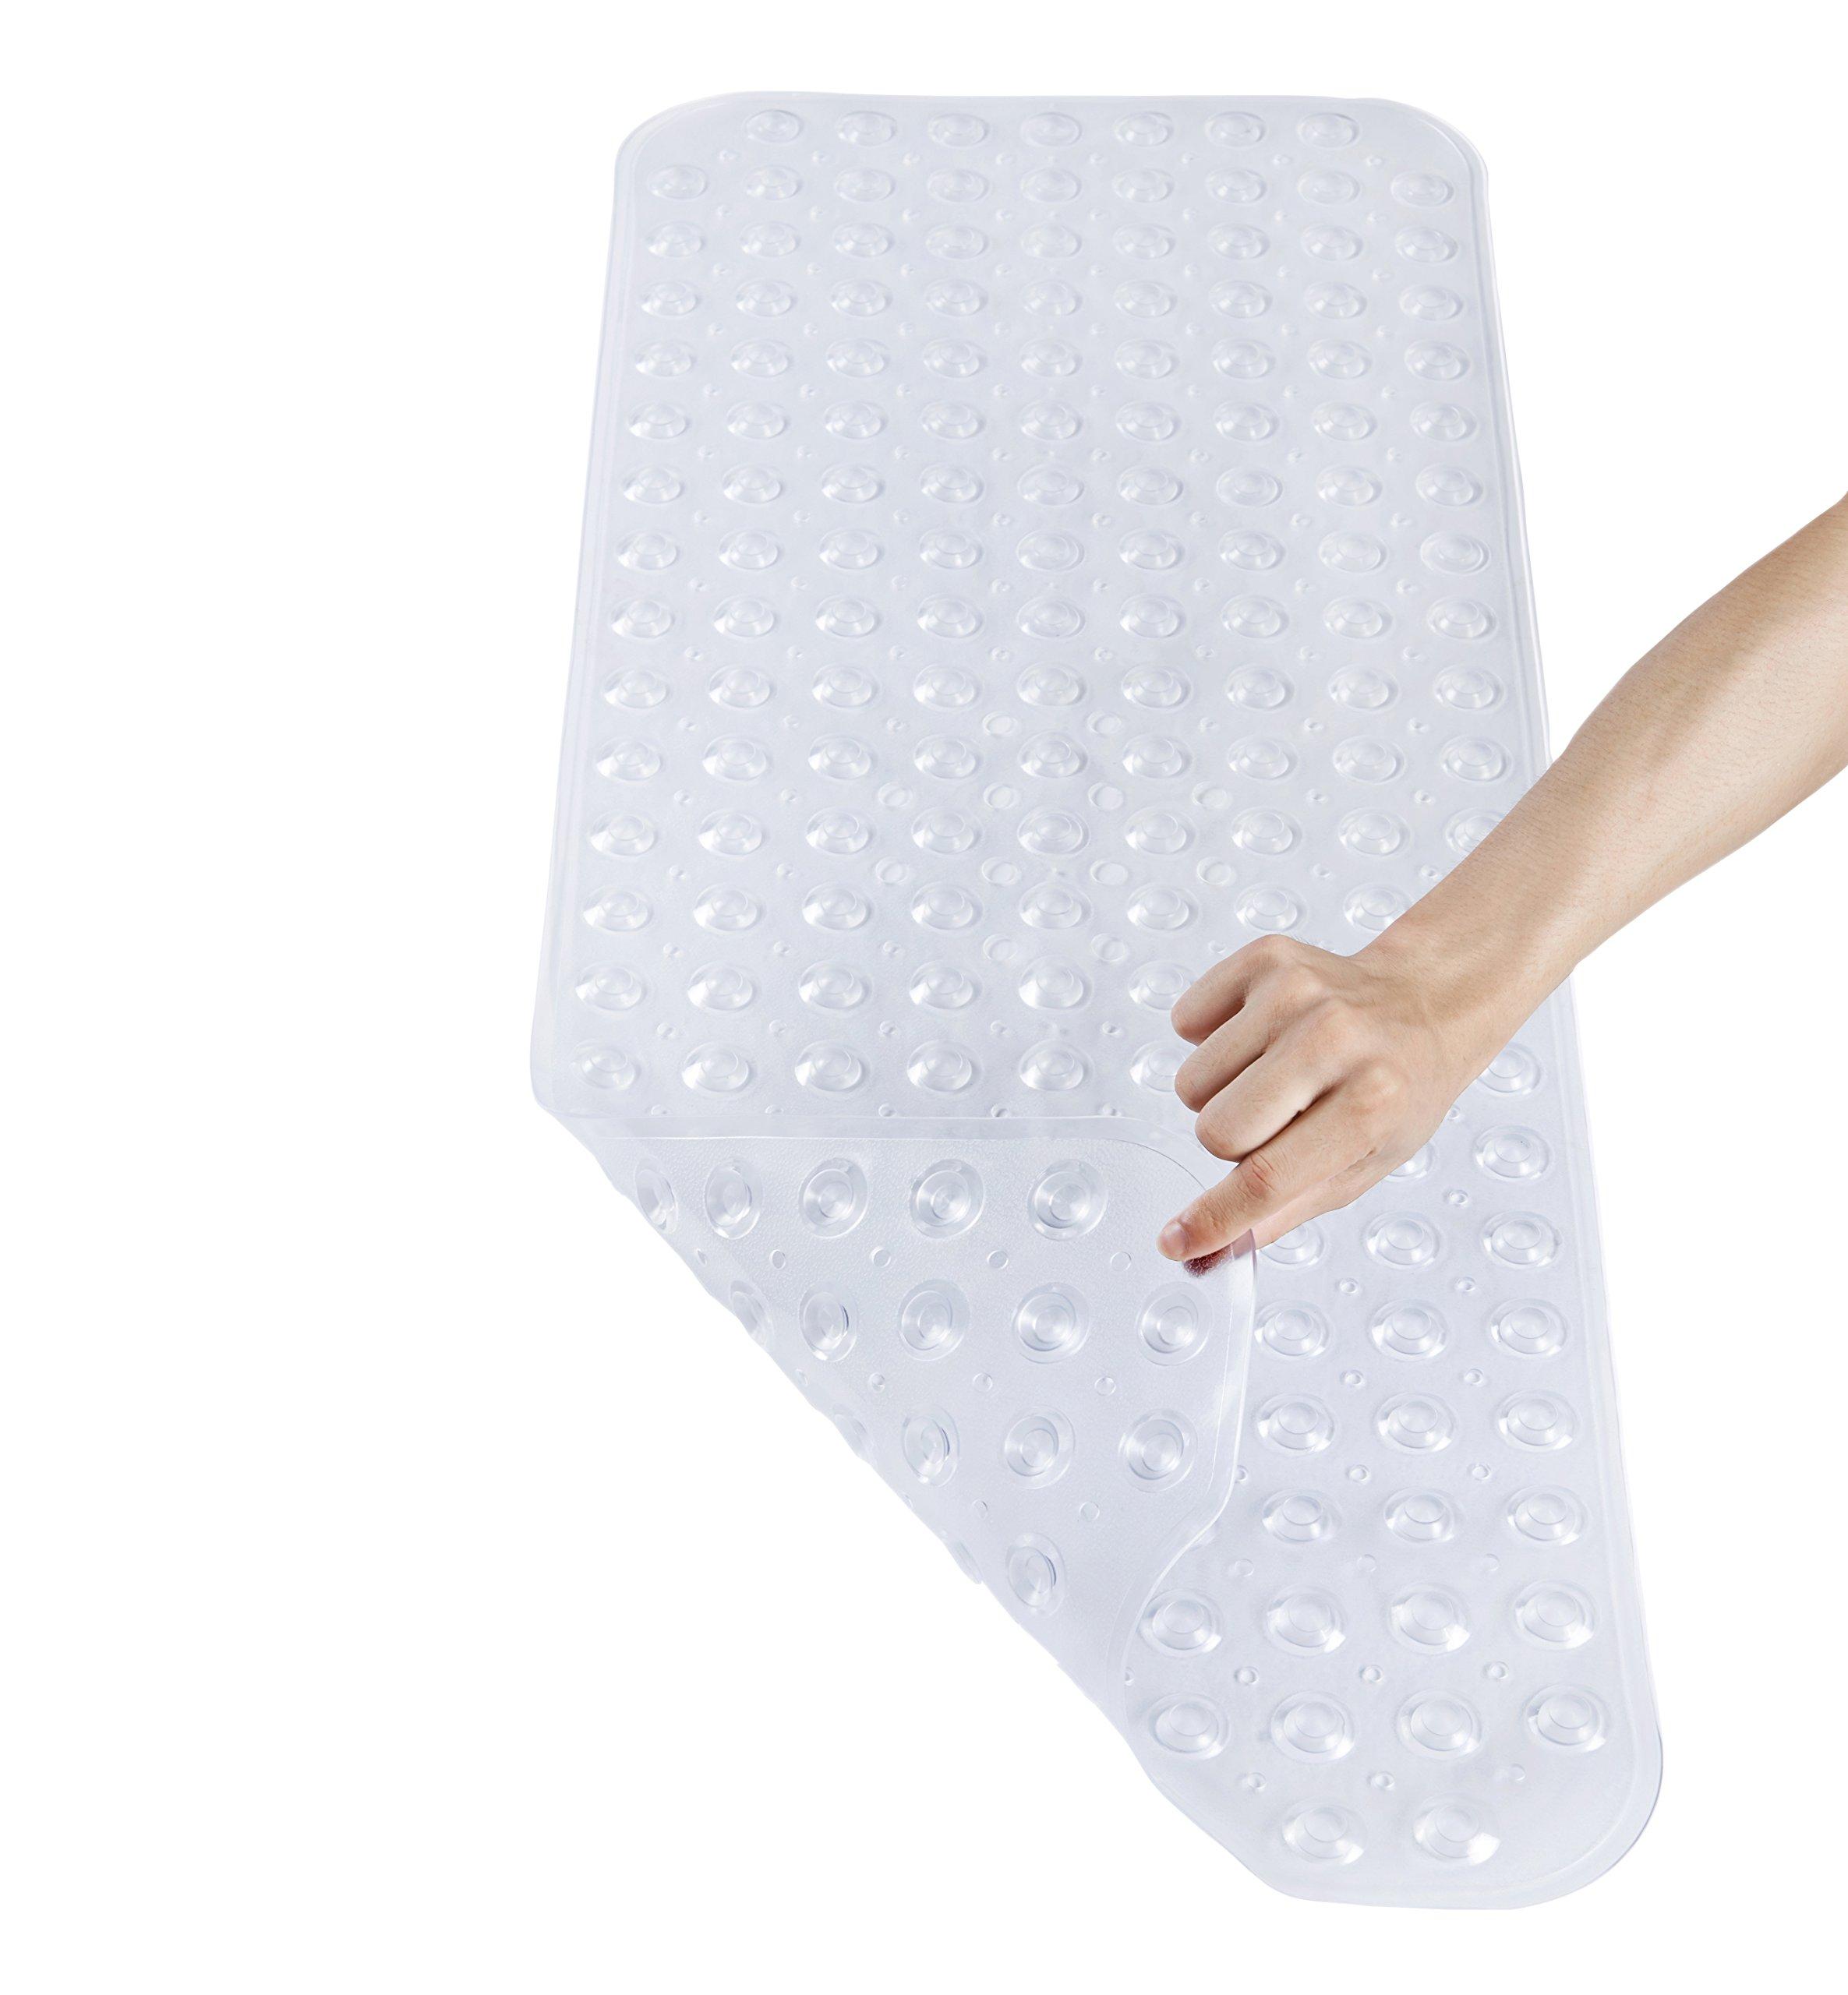 Simple Deluxe Anti-Slip Anti-Bacterial Simple Deluxe Slip-Resistant Bath Mat ...